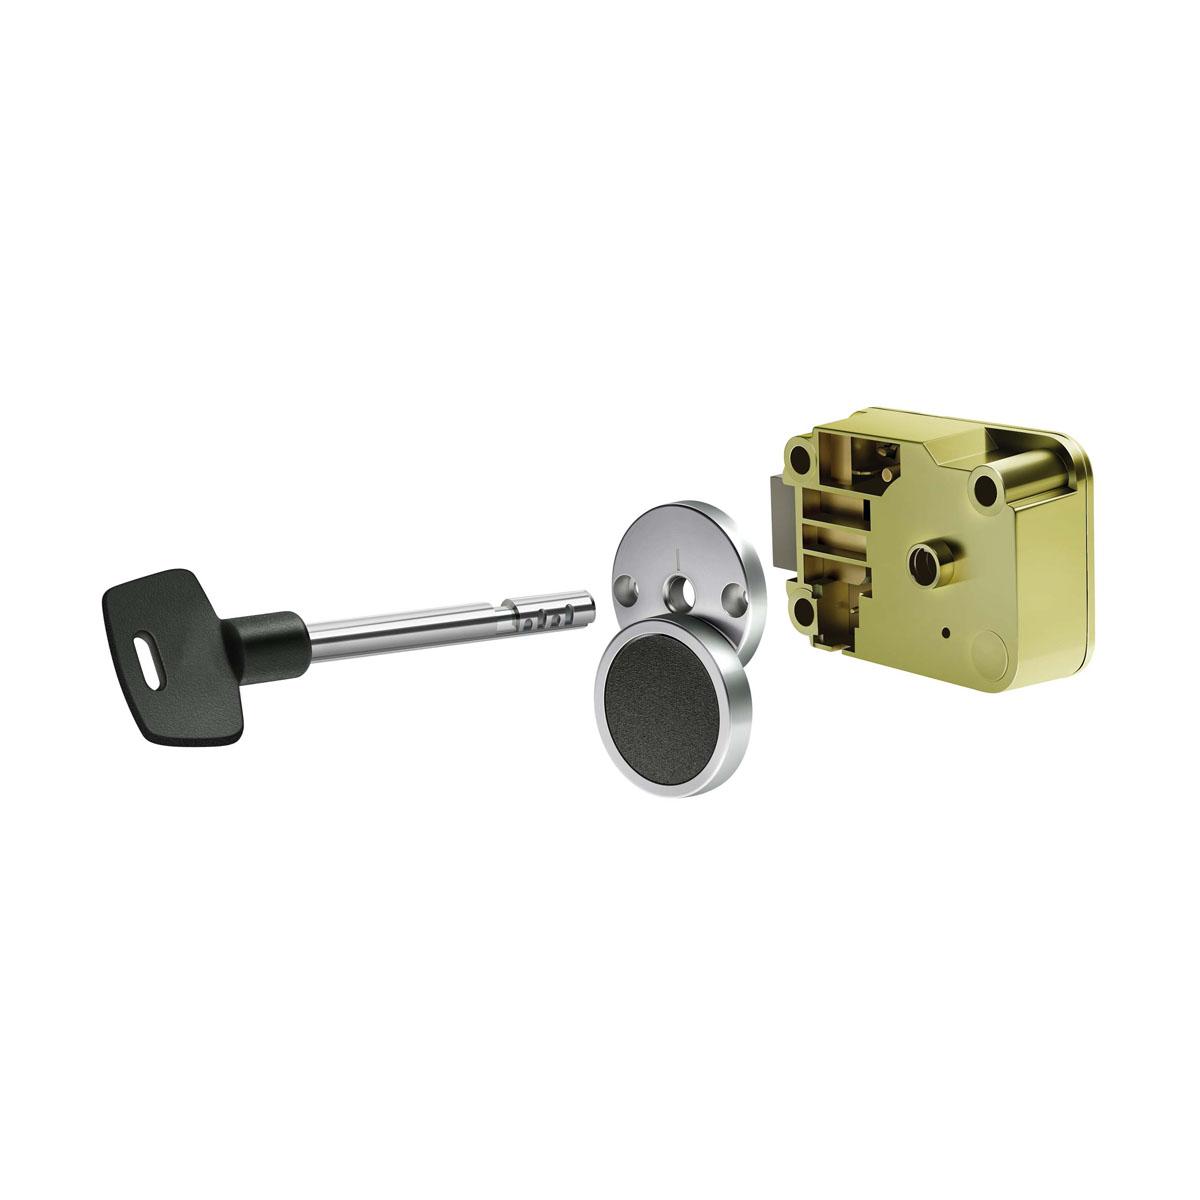 Kaba Mechanical Key Locks - LA GARD 2270